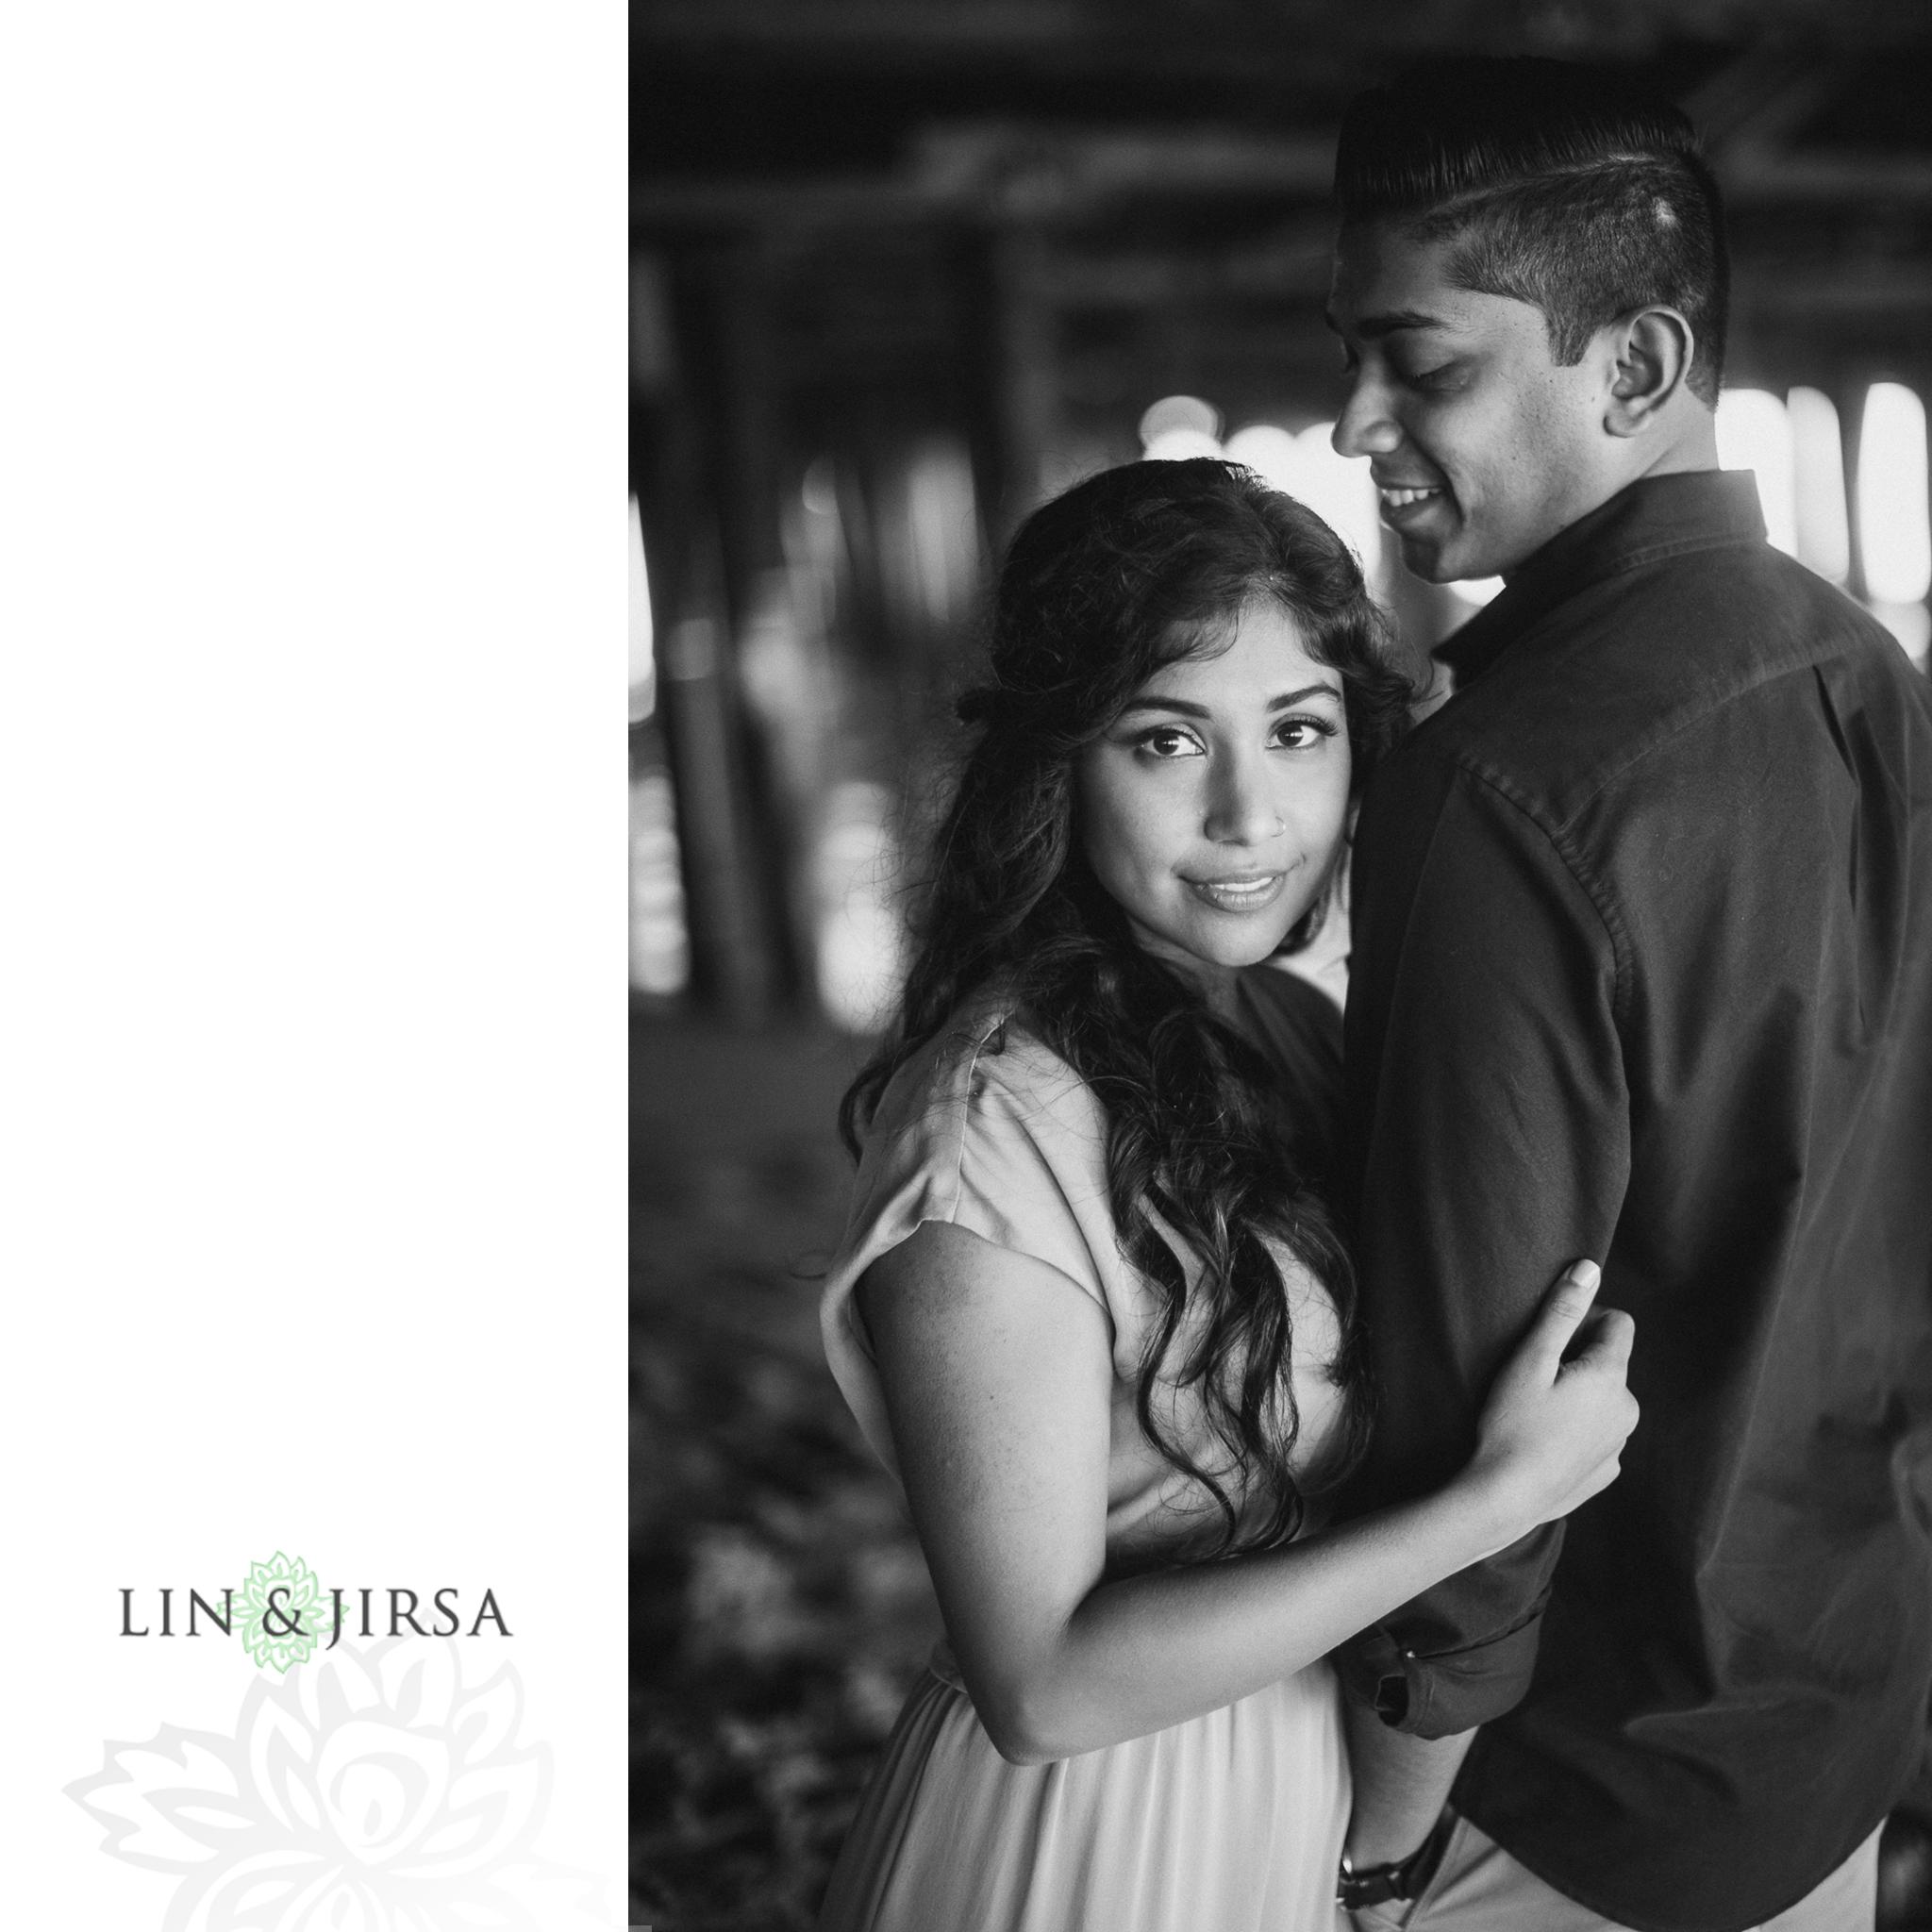 15-santa-monica-pier-los-angeles-engagement-photography